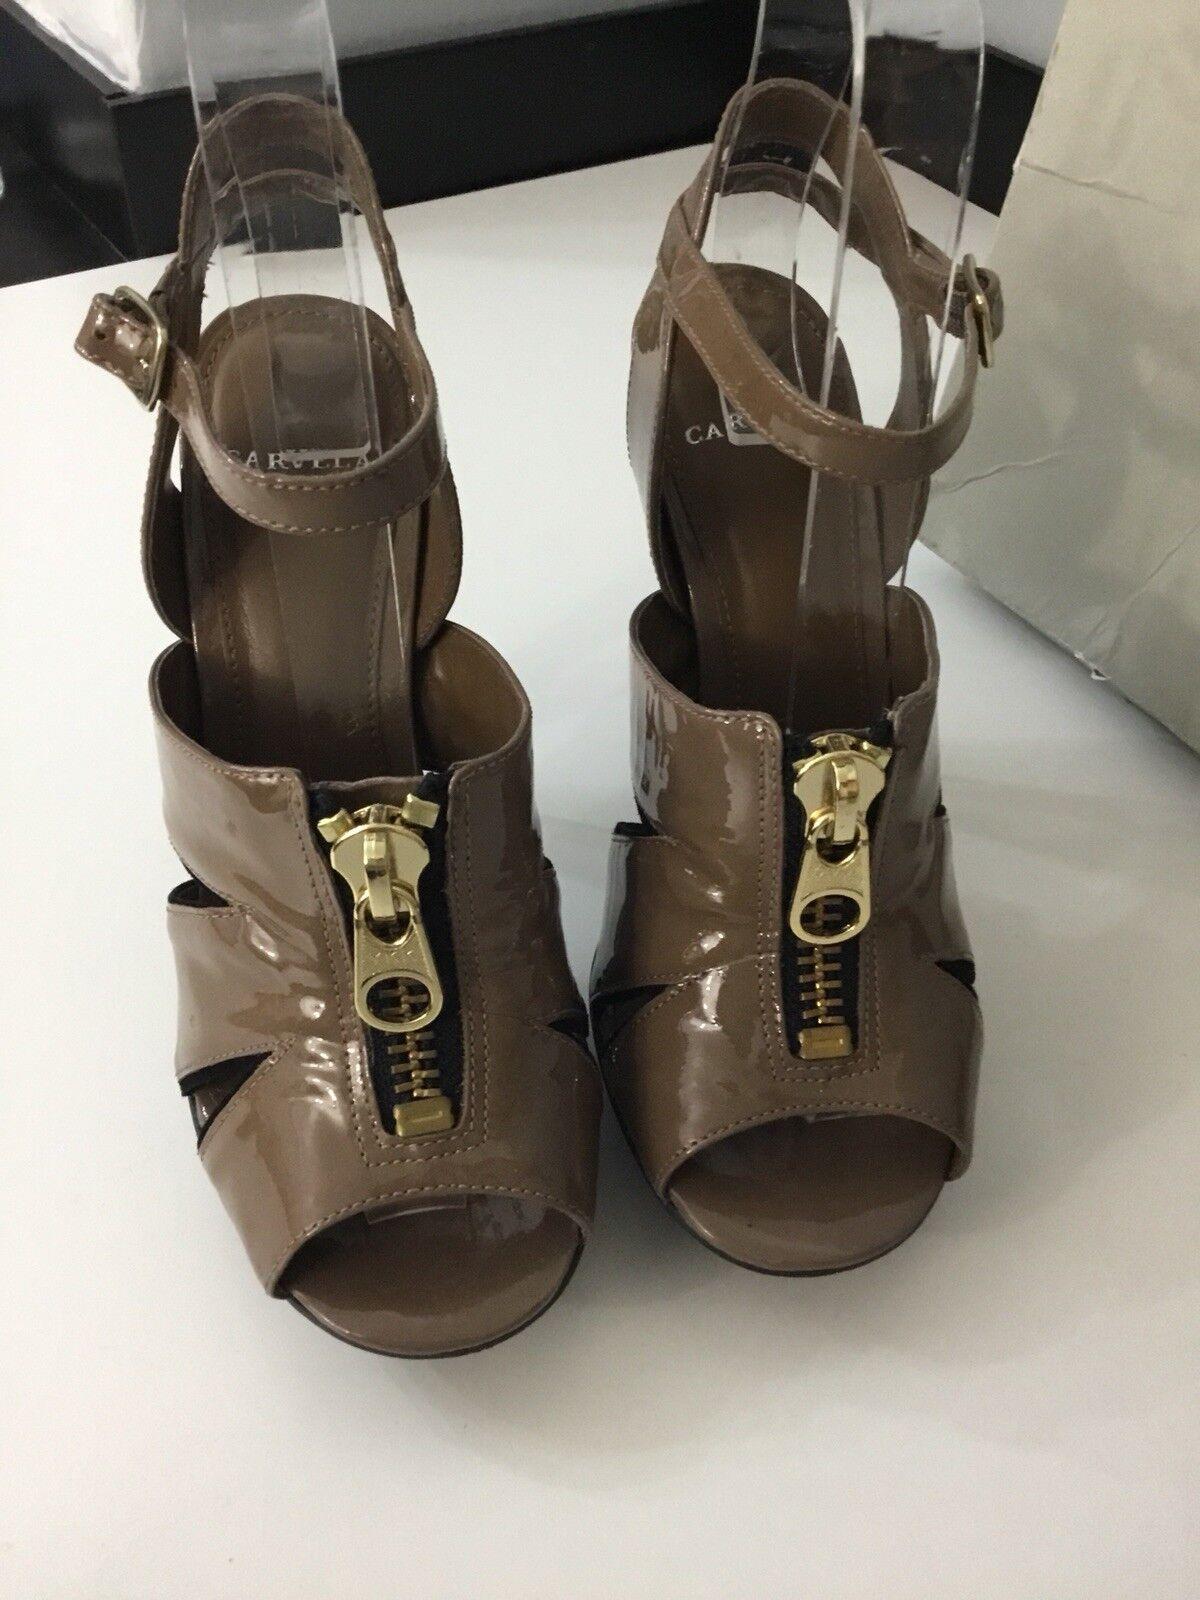 Carvela Womans, Brown, High Heels, shoes, Size Size Size Uk 4 Eu 37, Worn Once, Peep Toe 4a2704